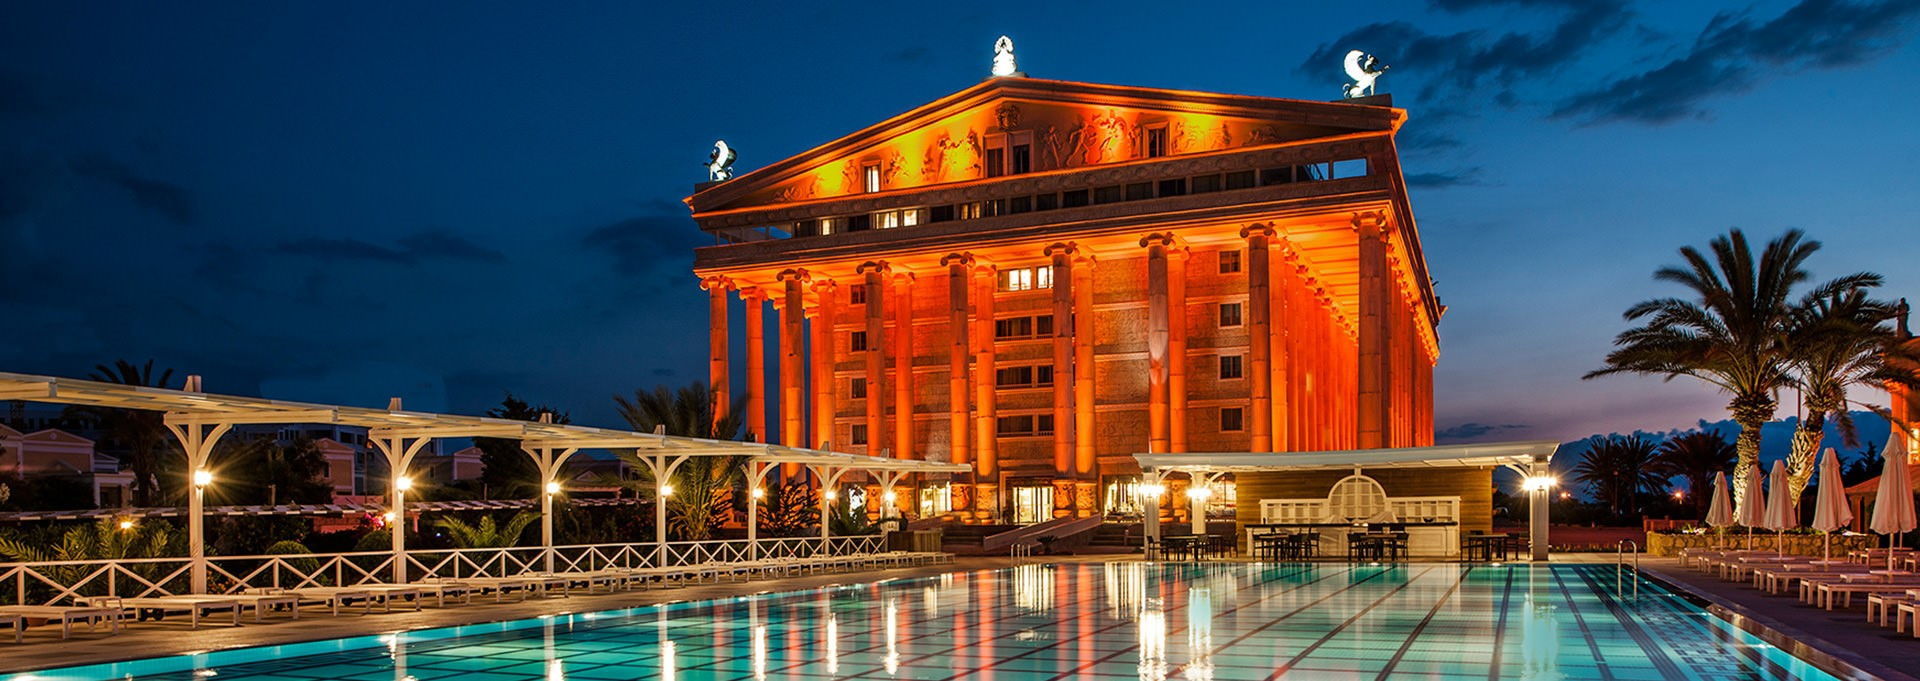 Kaya Artemis Resort Hotel & Casino